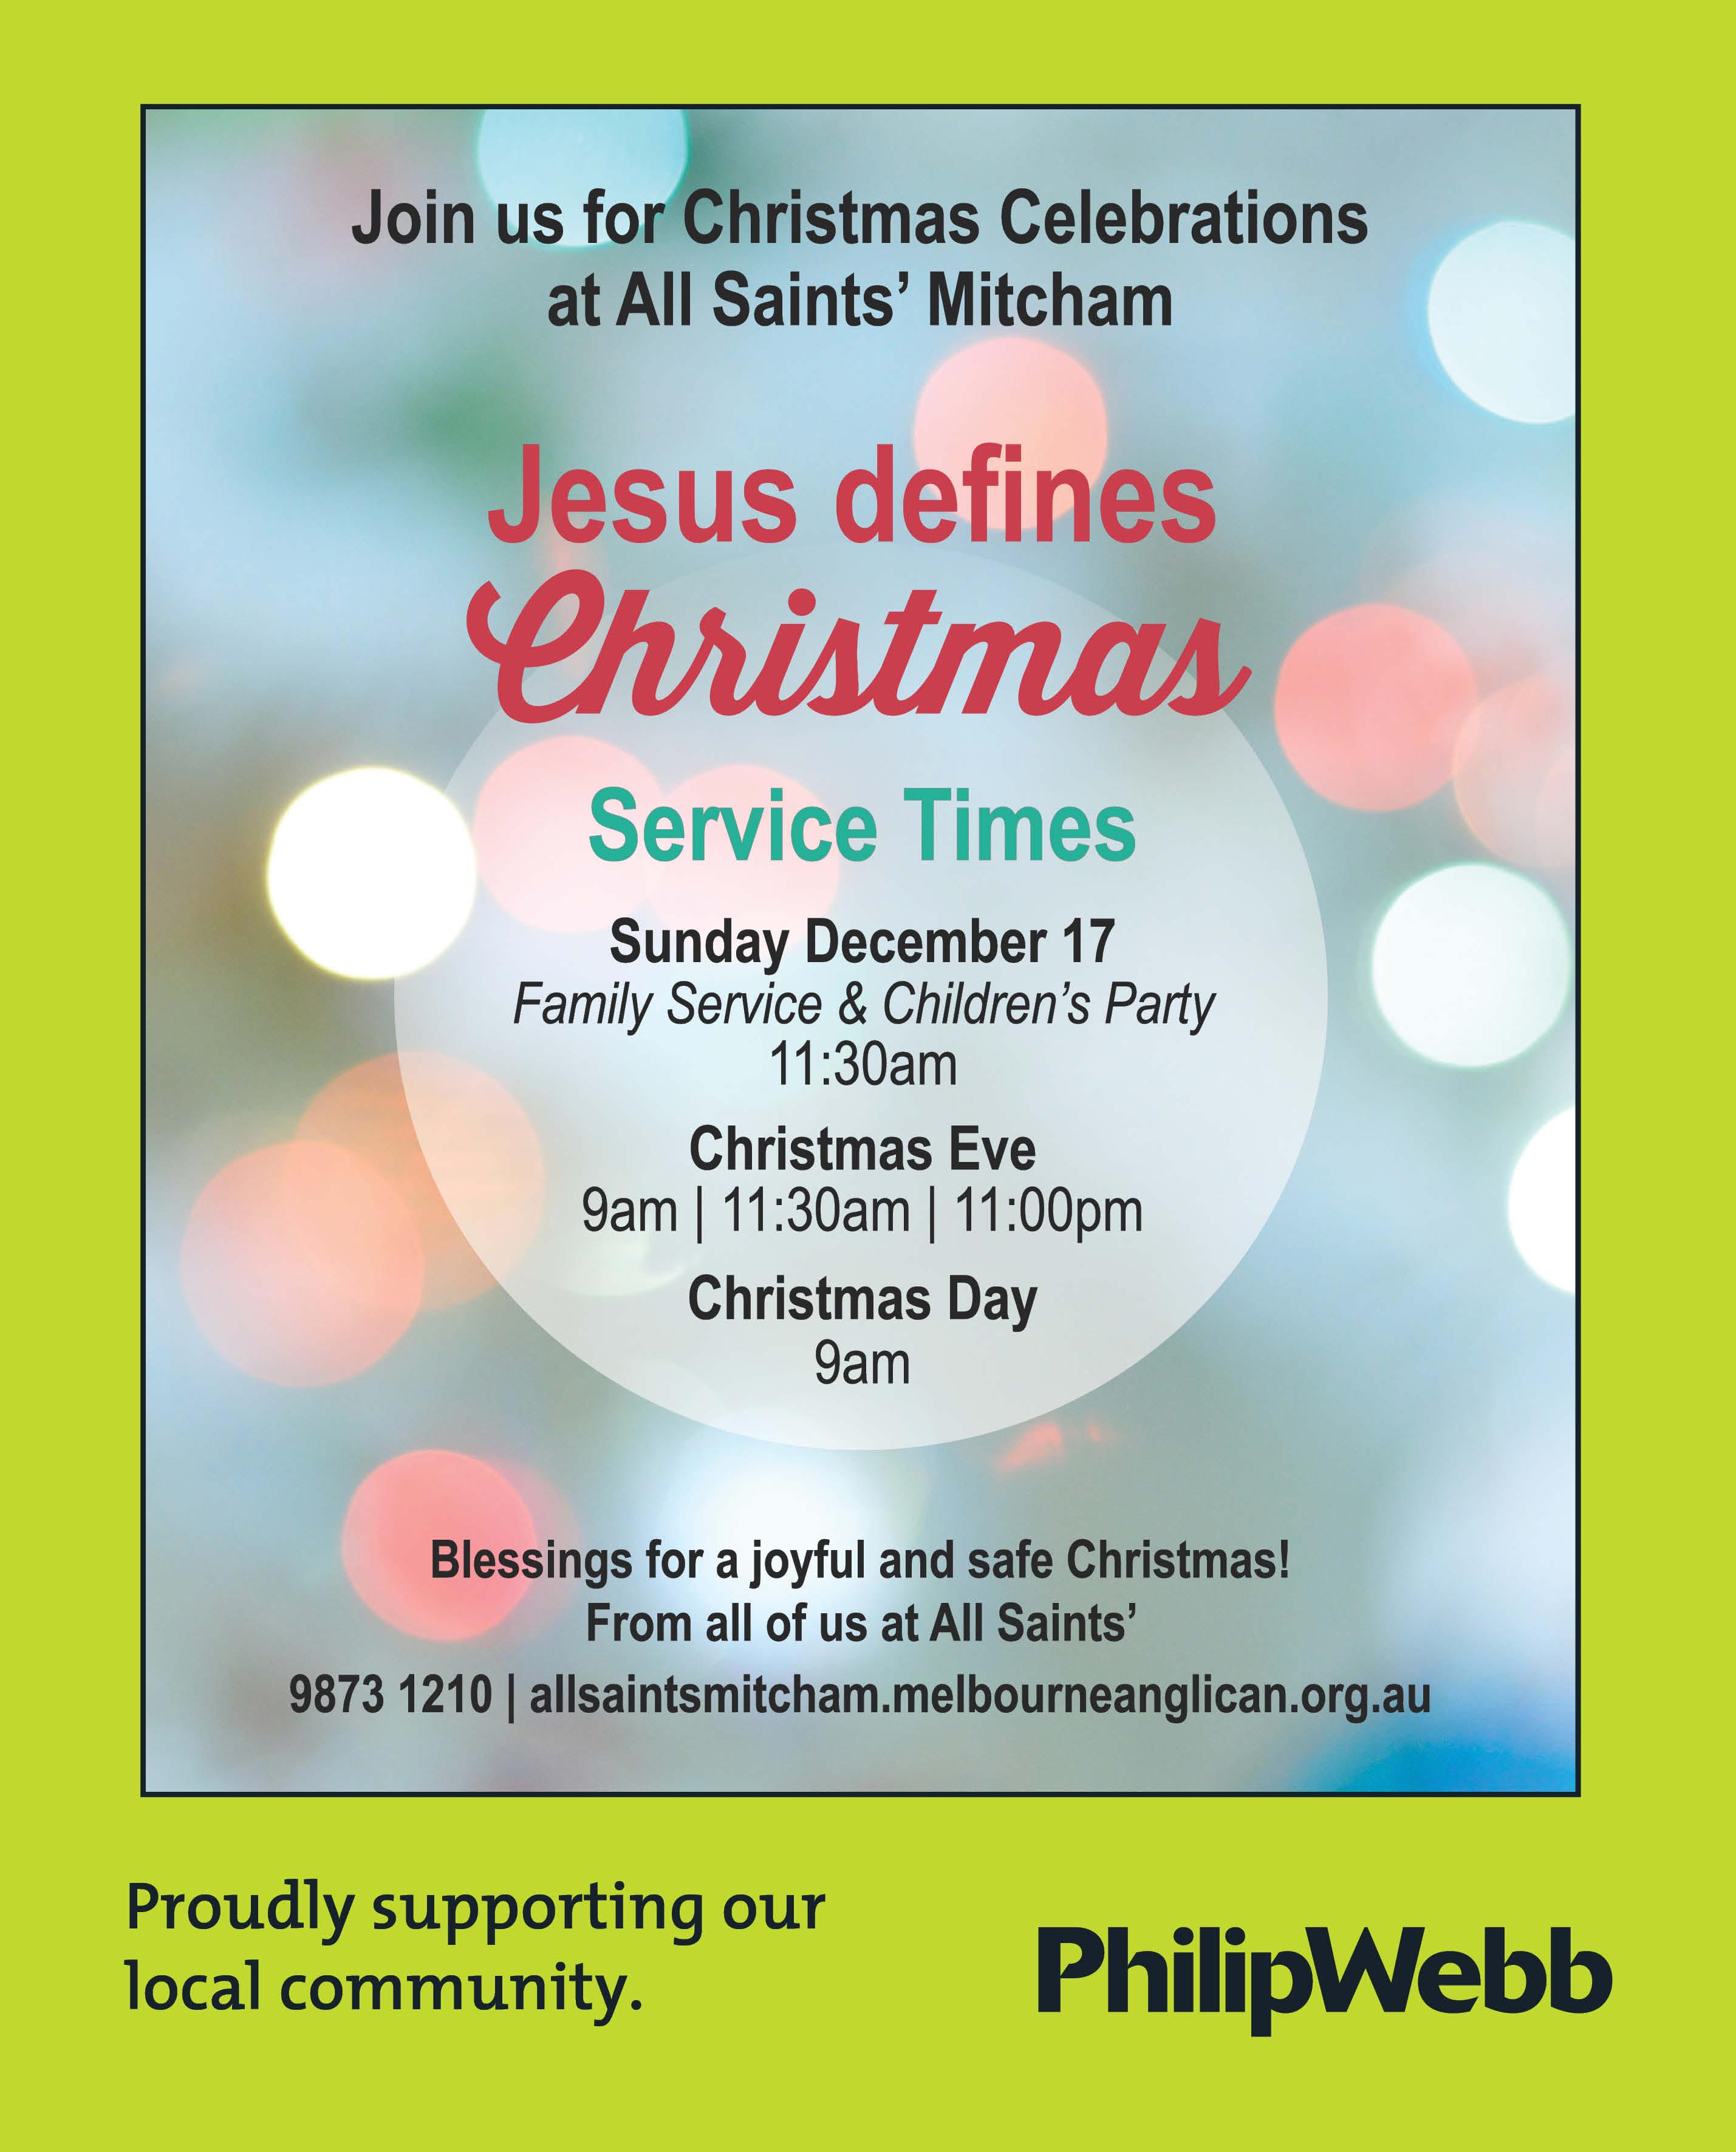 Christmas Celebrations at All Saints' Mitcham